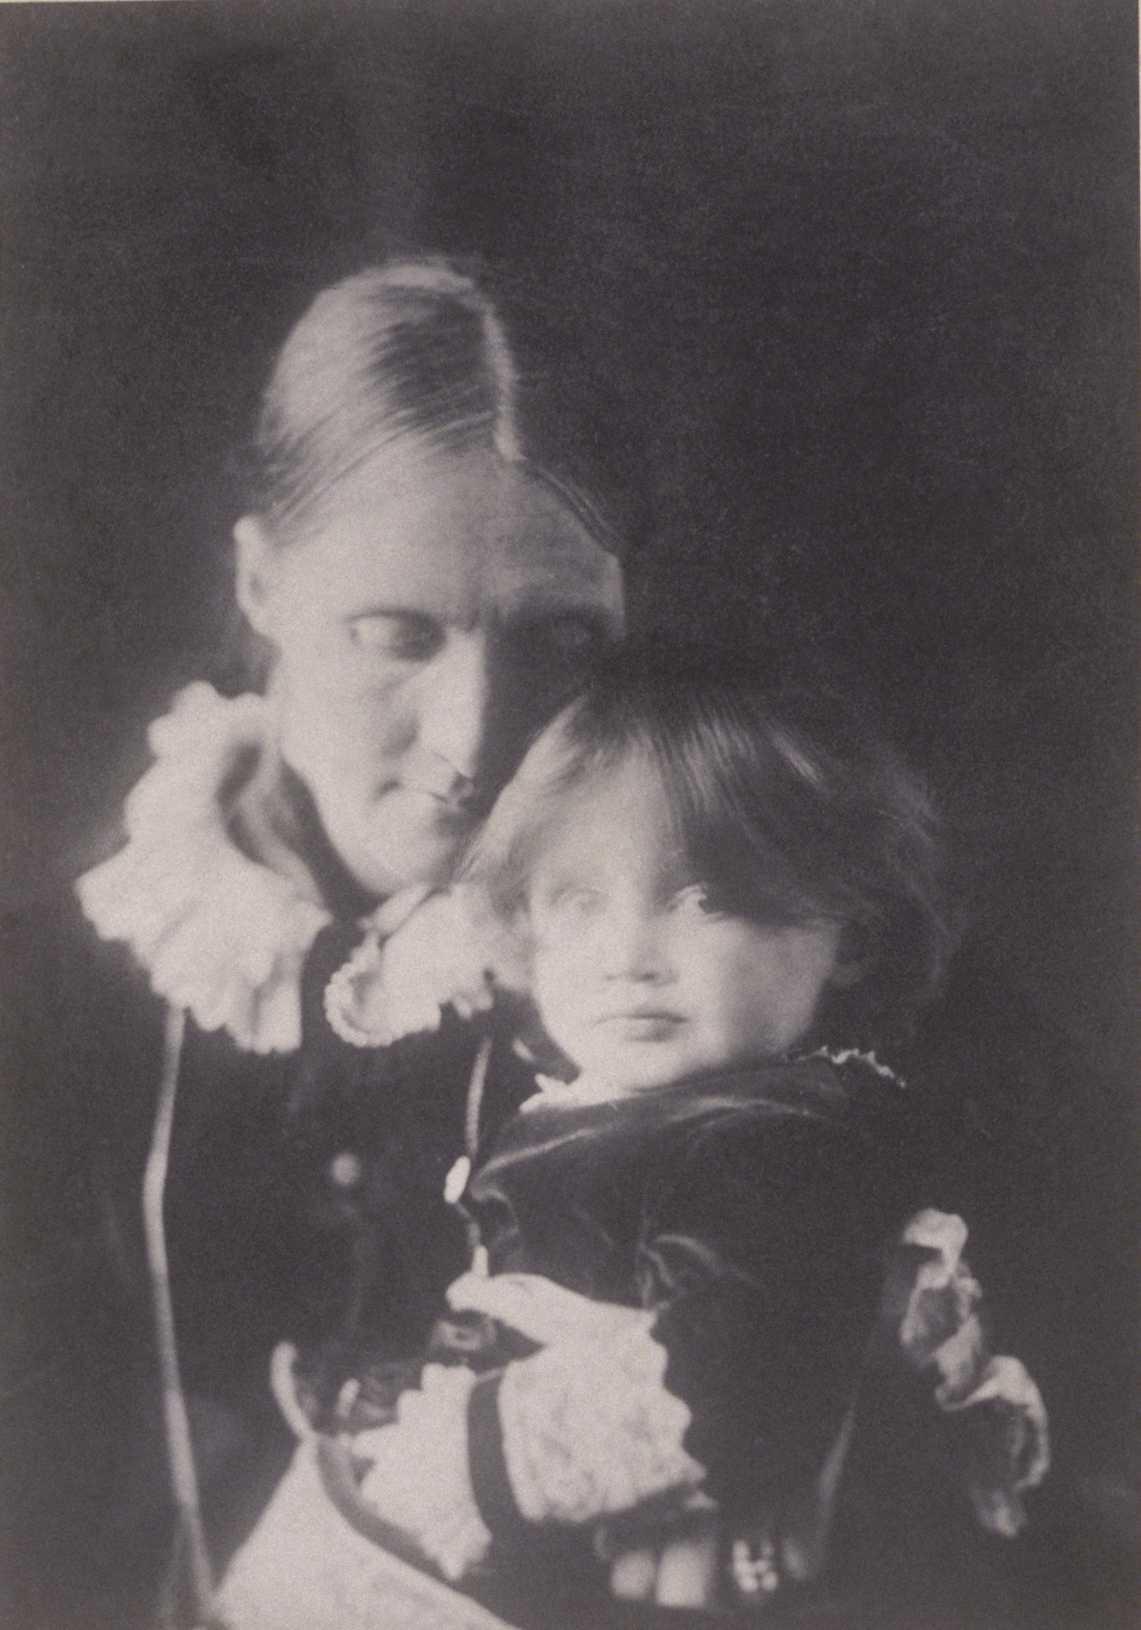 Julia Stephen with Virginia on her lap 1884.jpg